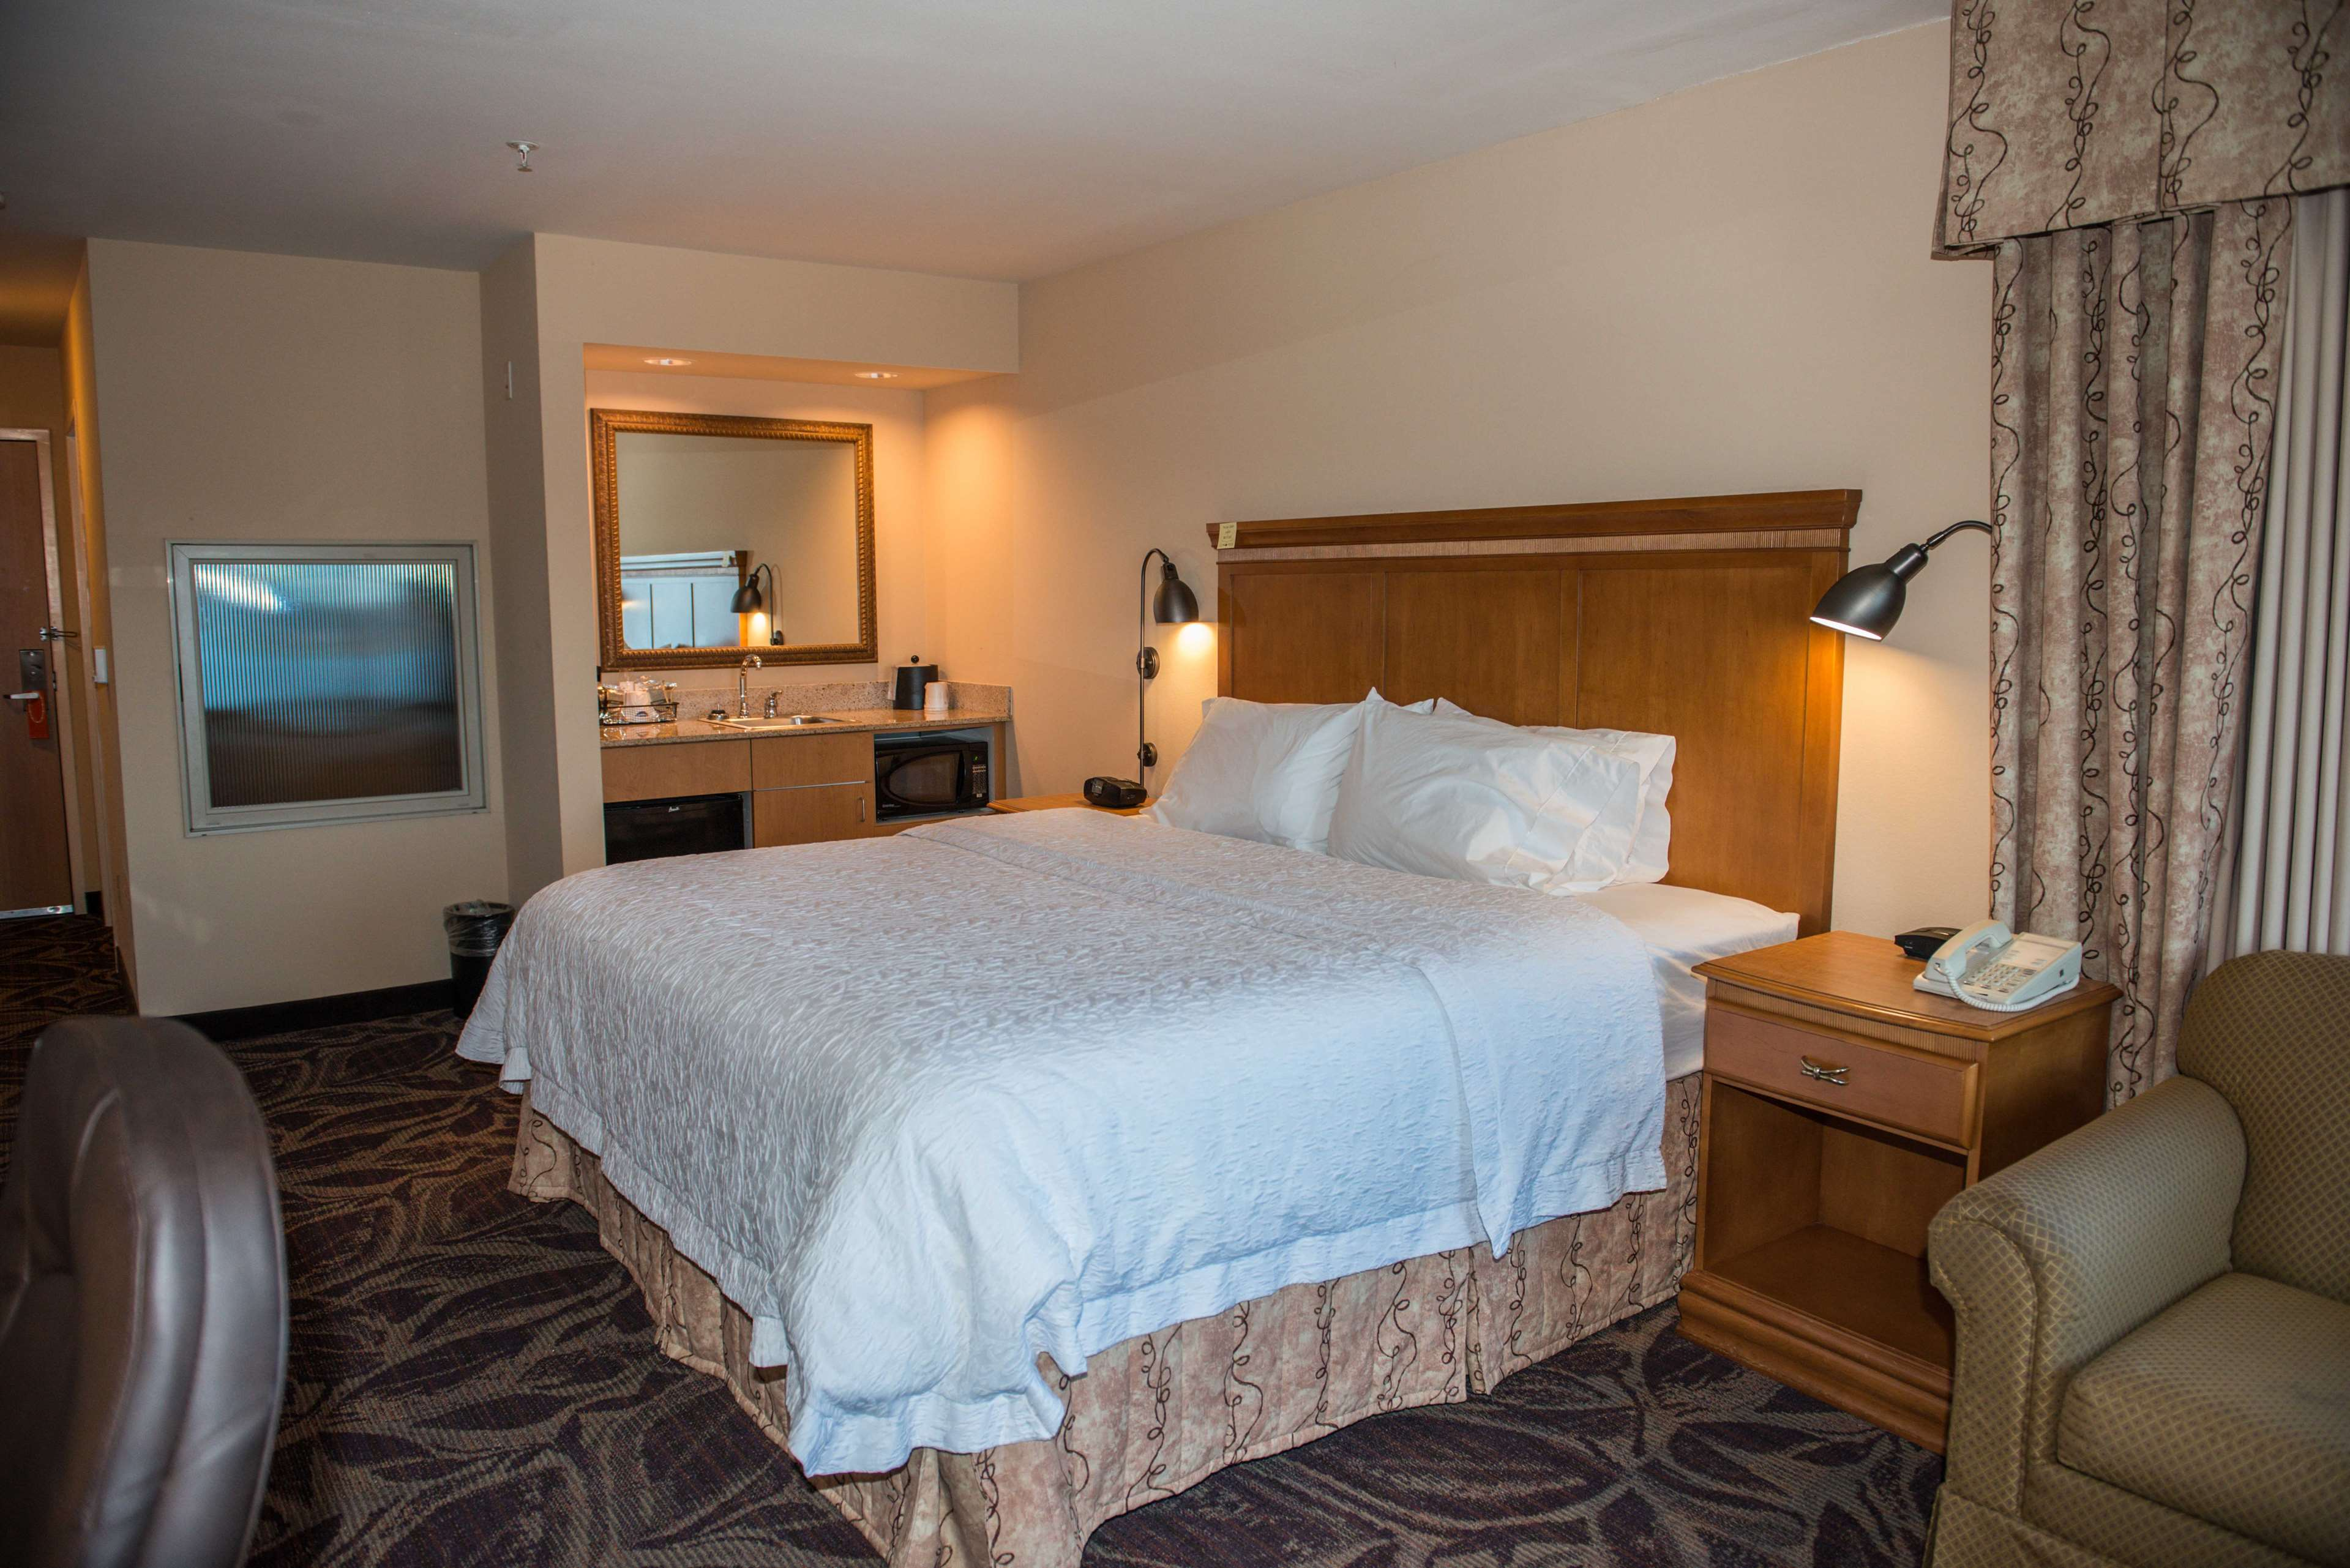 Hampton Inn & Suites Bremerton image 30